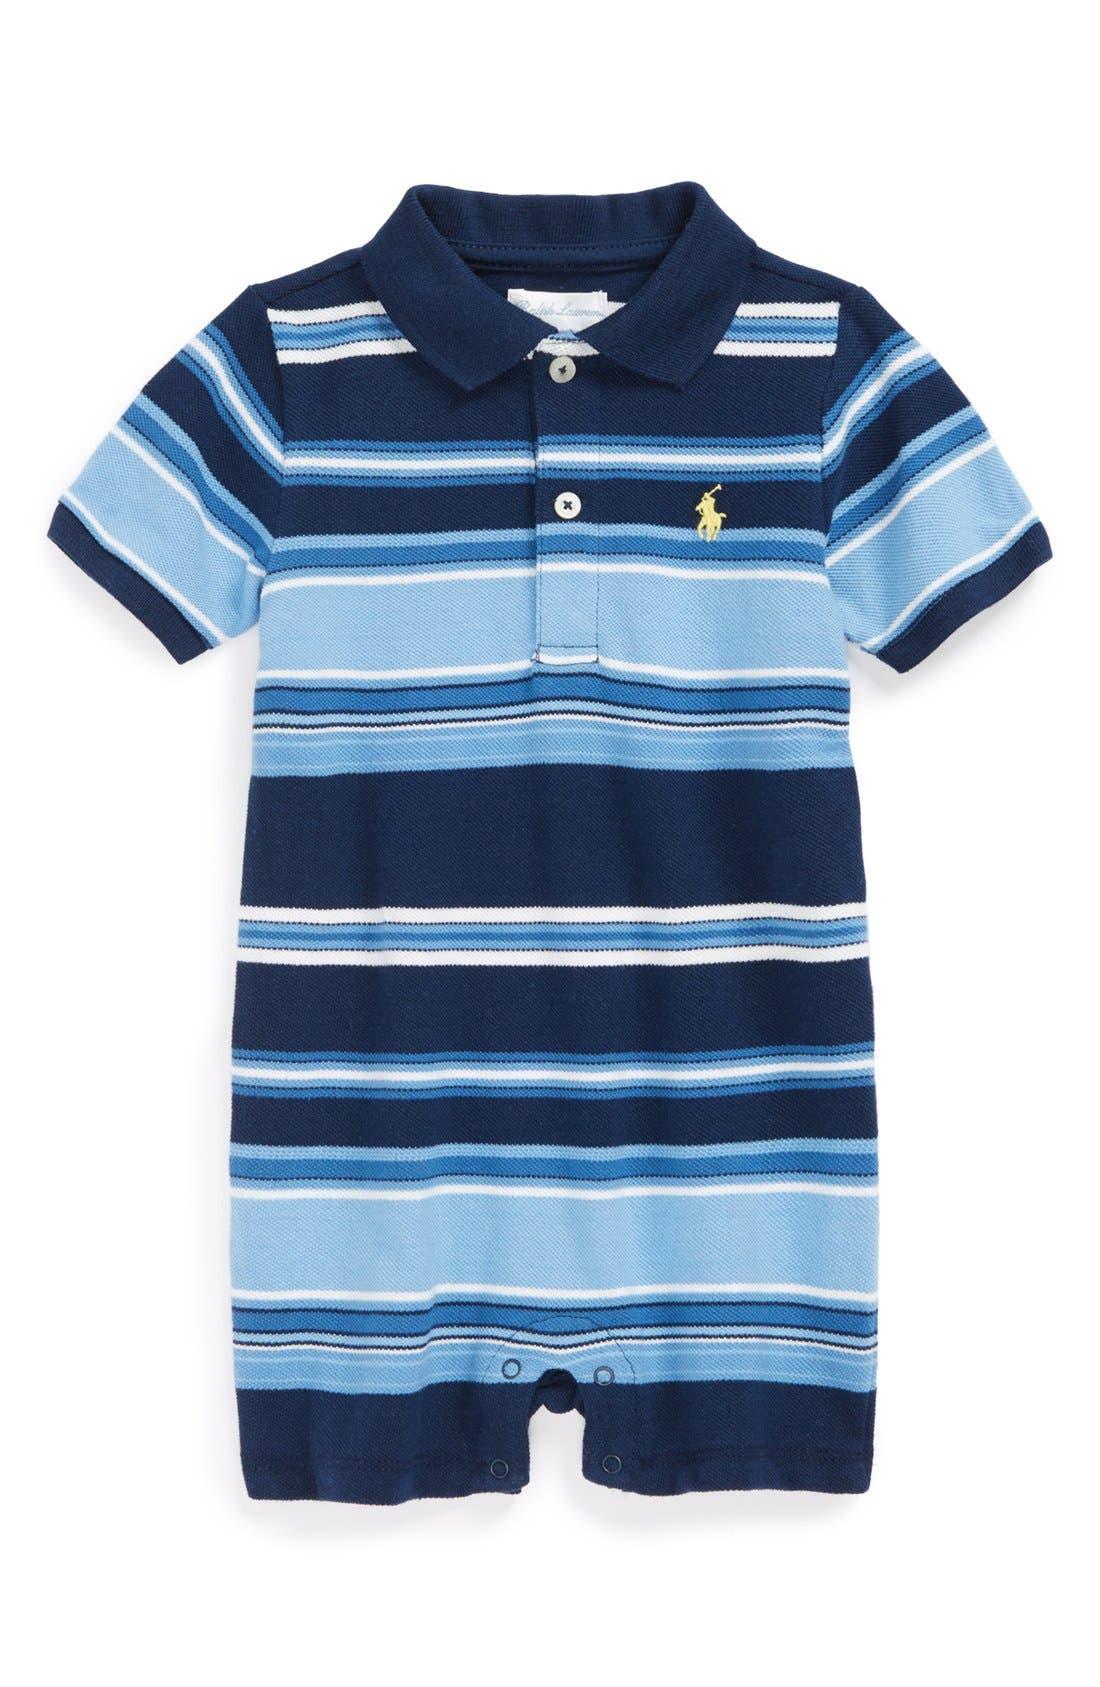 Alternate Image 1 Selected - Ralph Lauren Stripe Cotton Romper (Baby Boys)